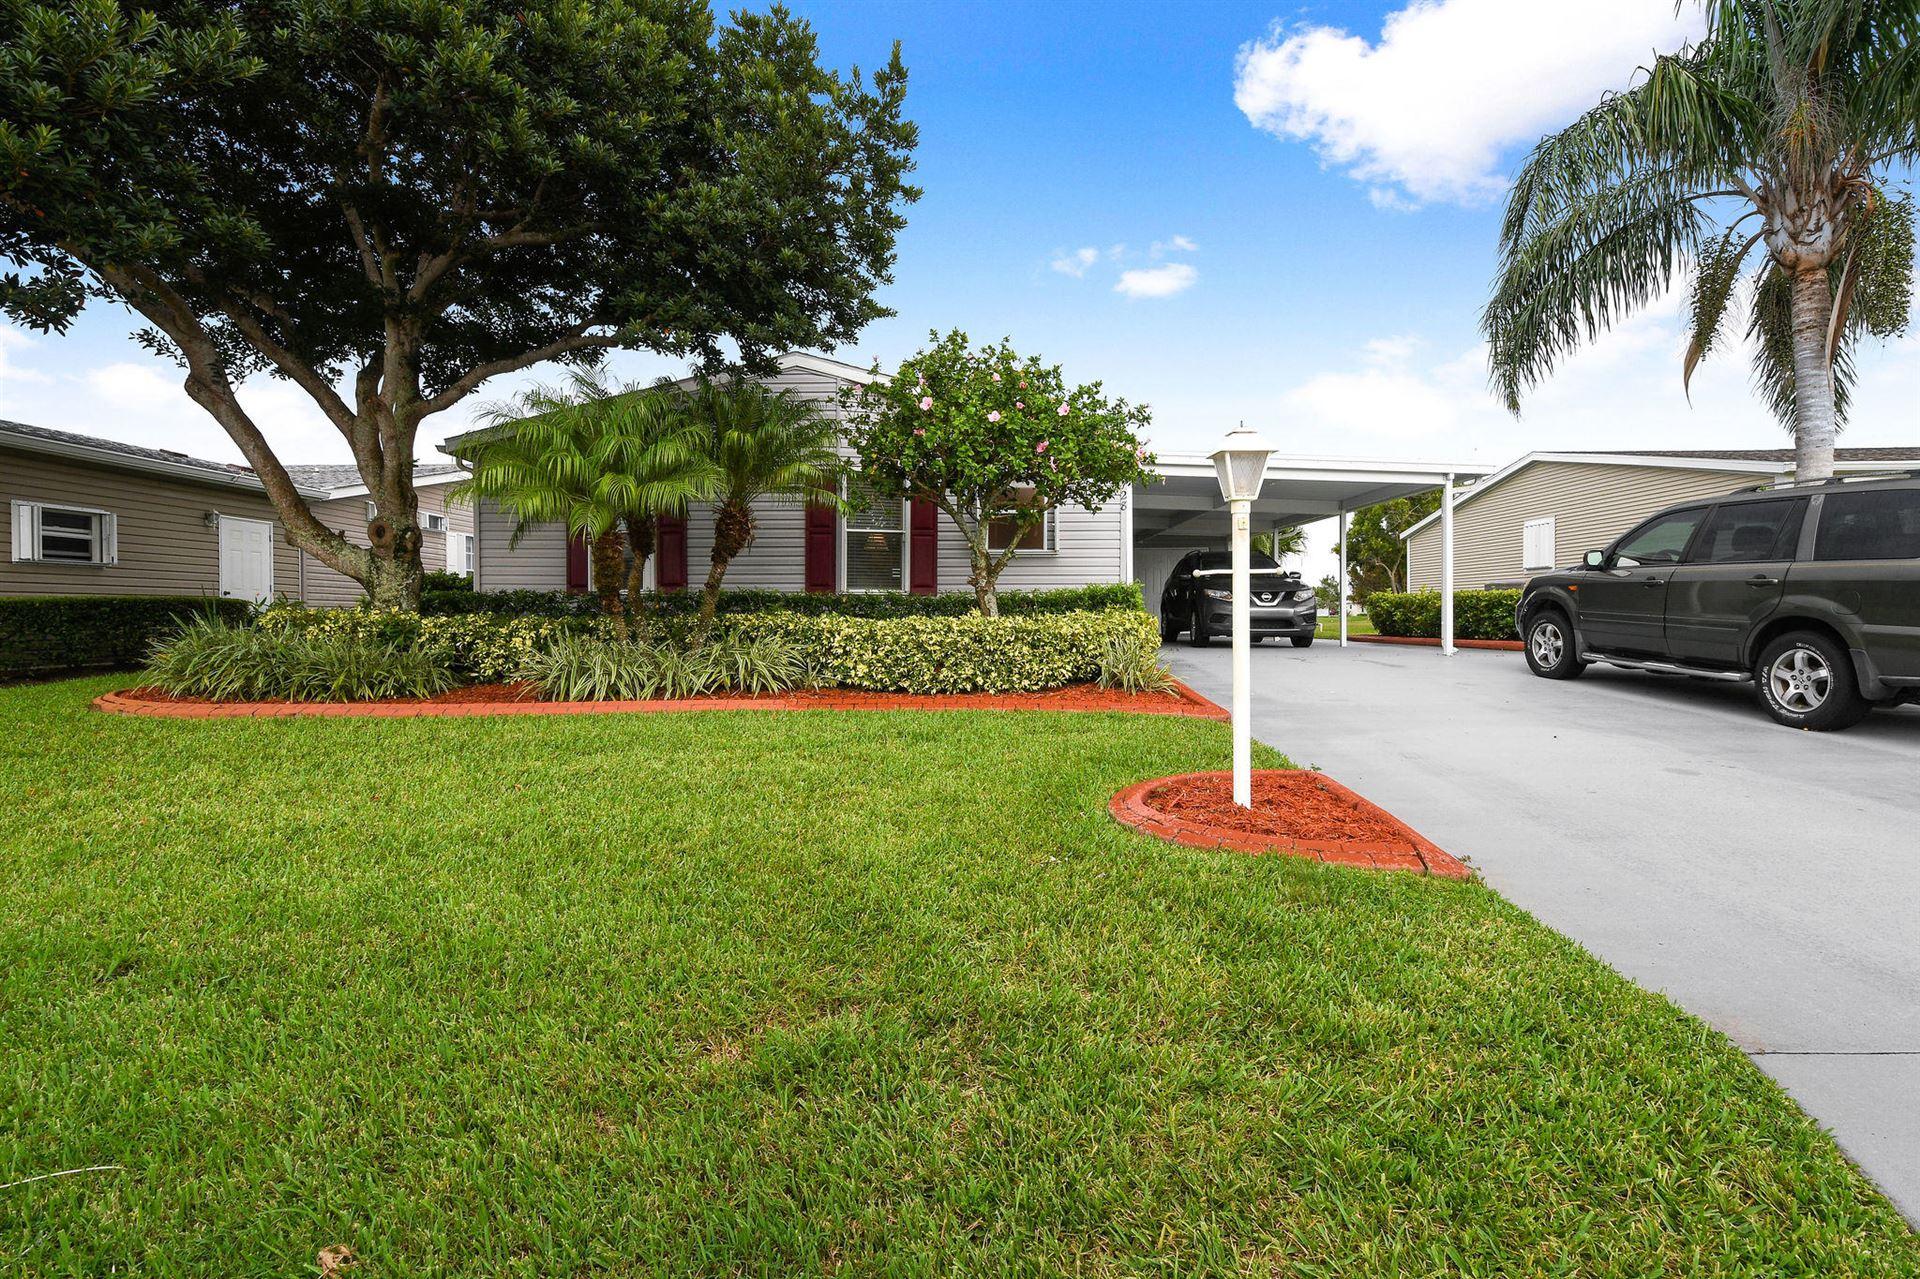 7728 Mcclintock Way, Port Saint Lucie, FL 34952 - #: RX-10657850